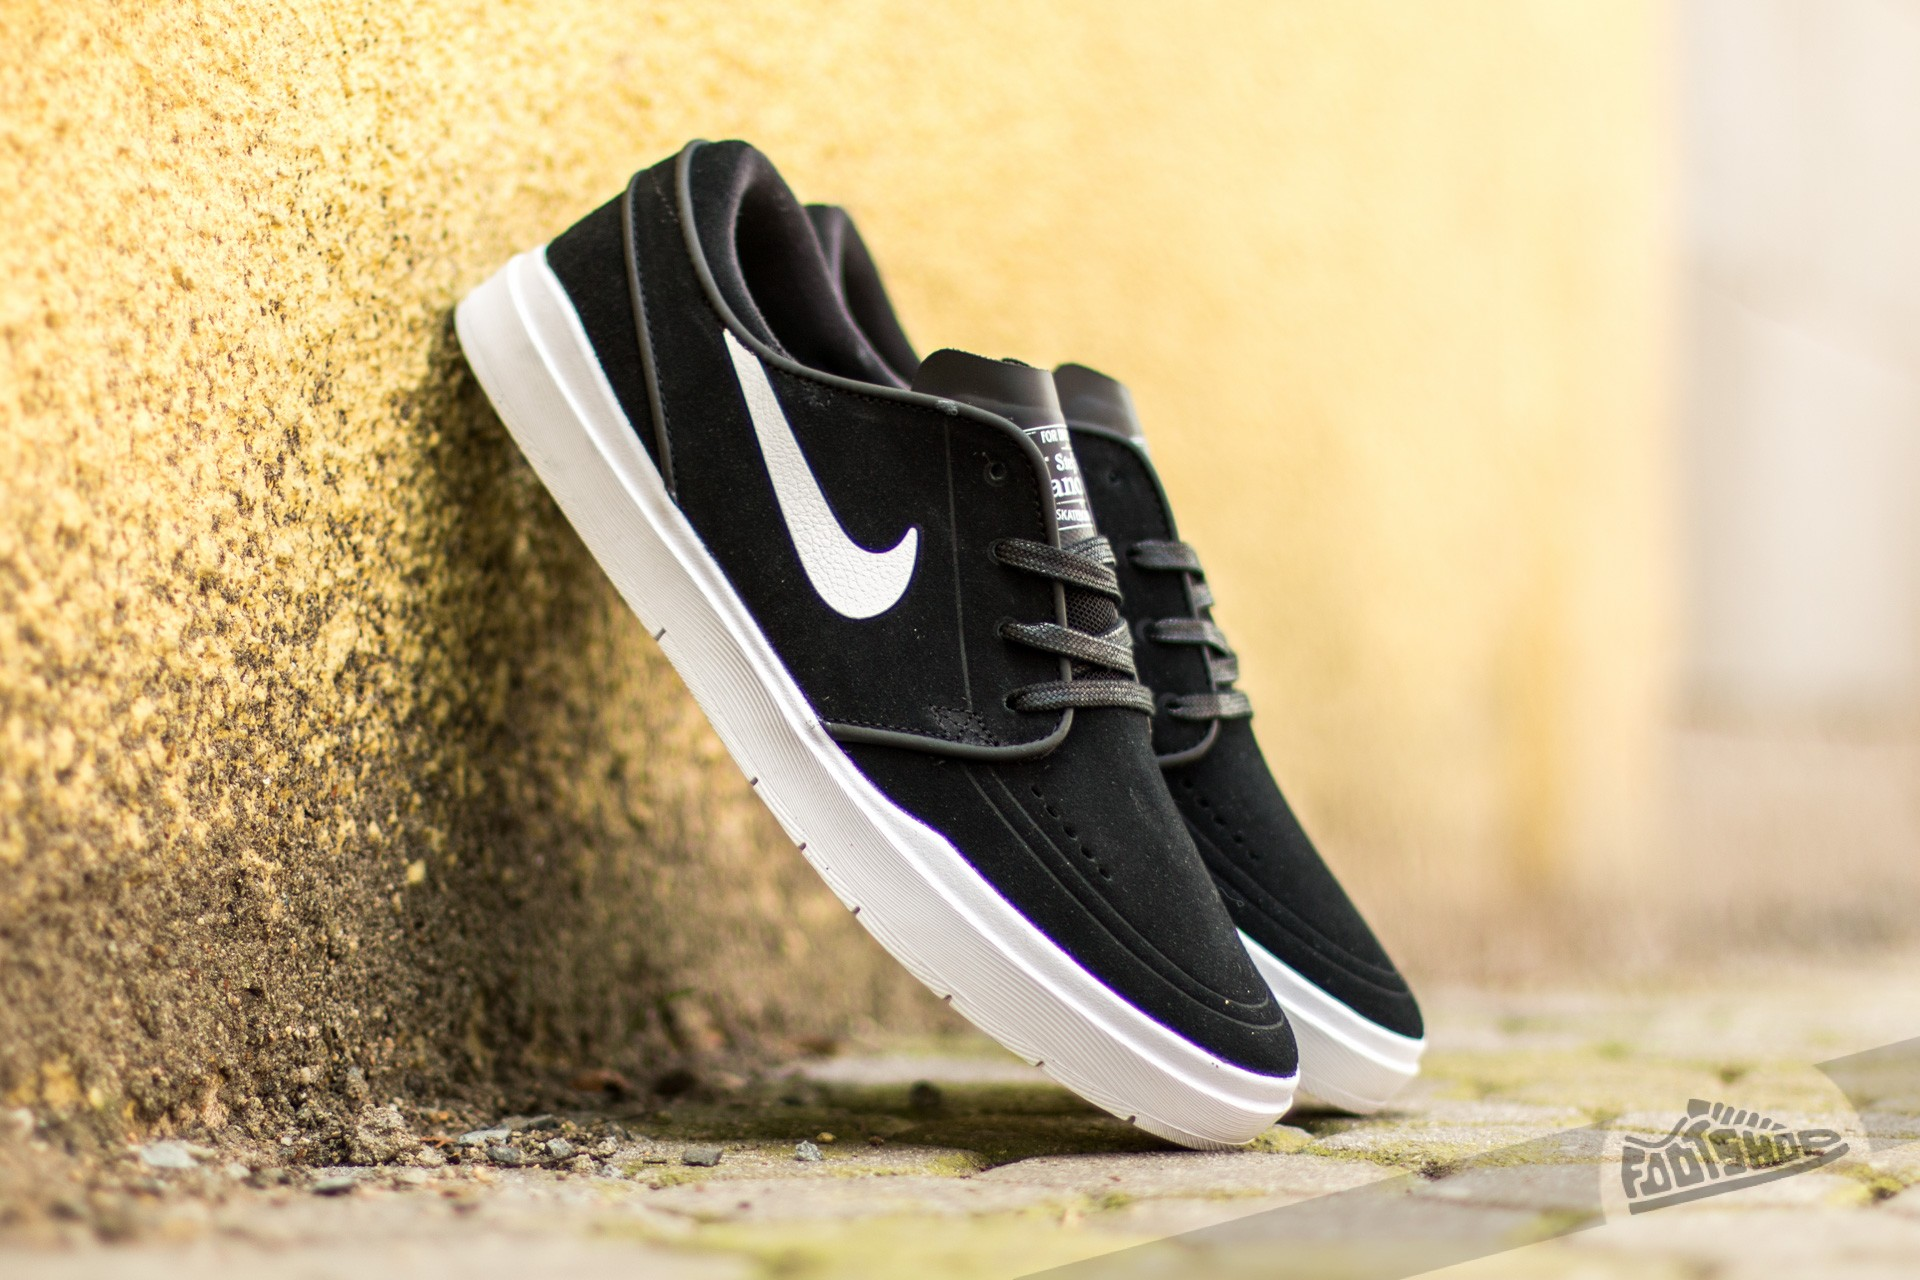 recuerda tallarines Estúpido  Men's shoes Nike Stefan Janoski Hyperfeel Black/ White | Footshop